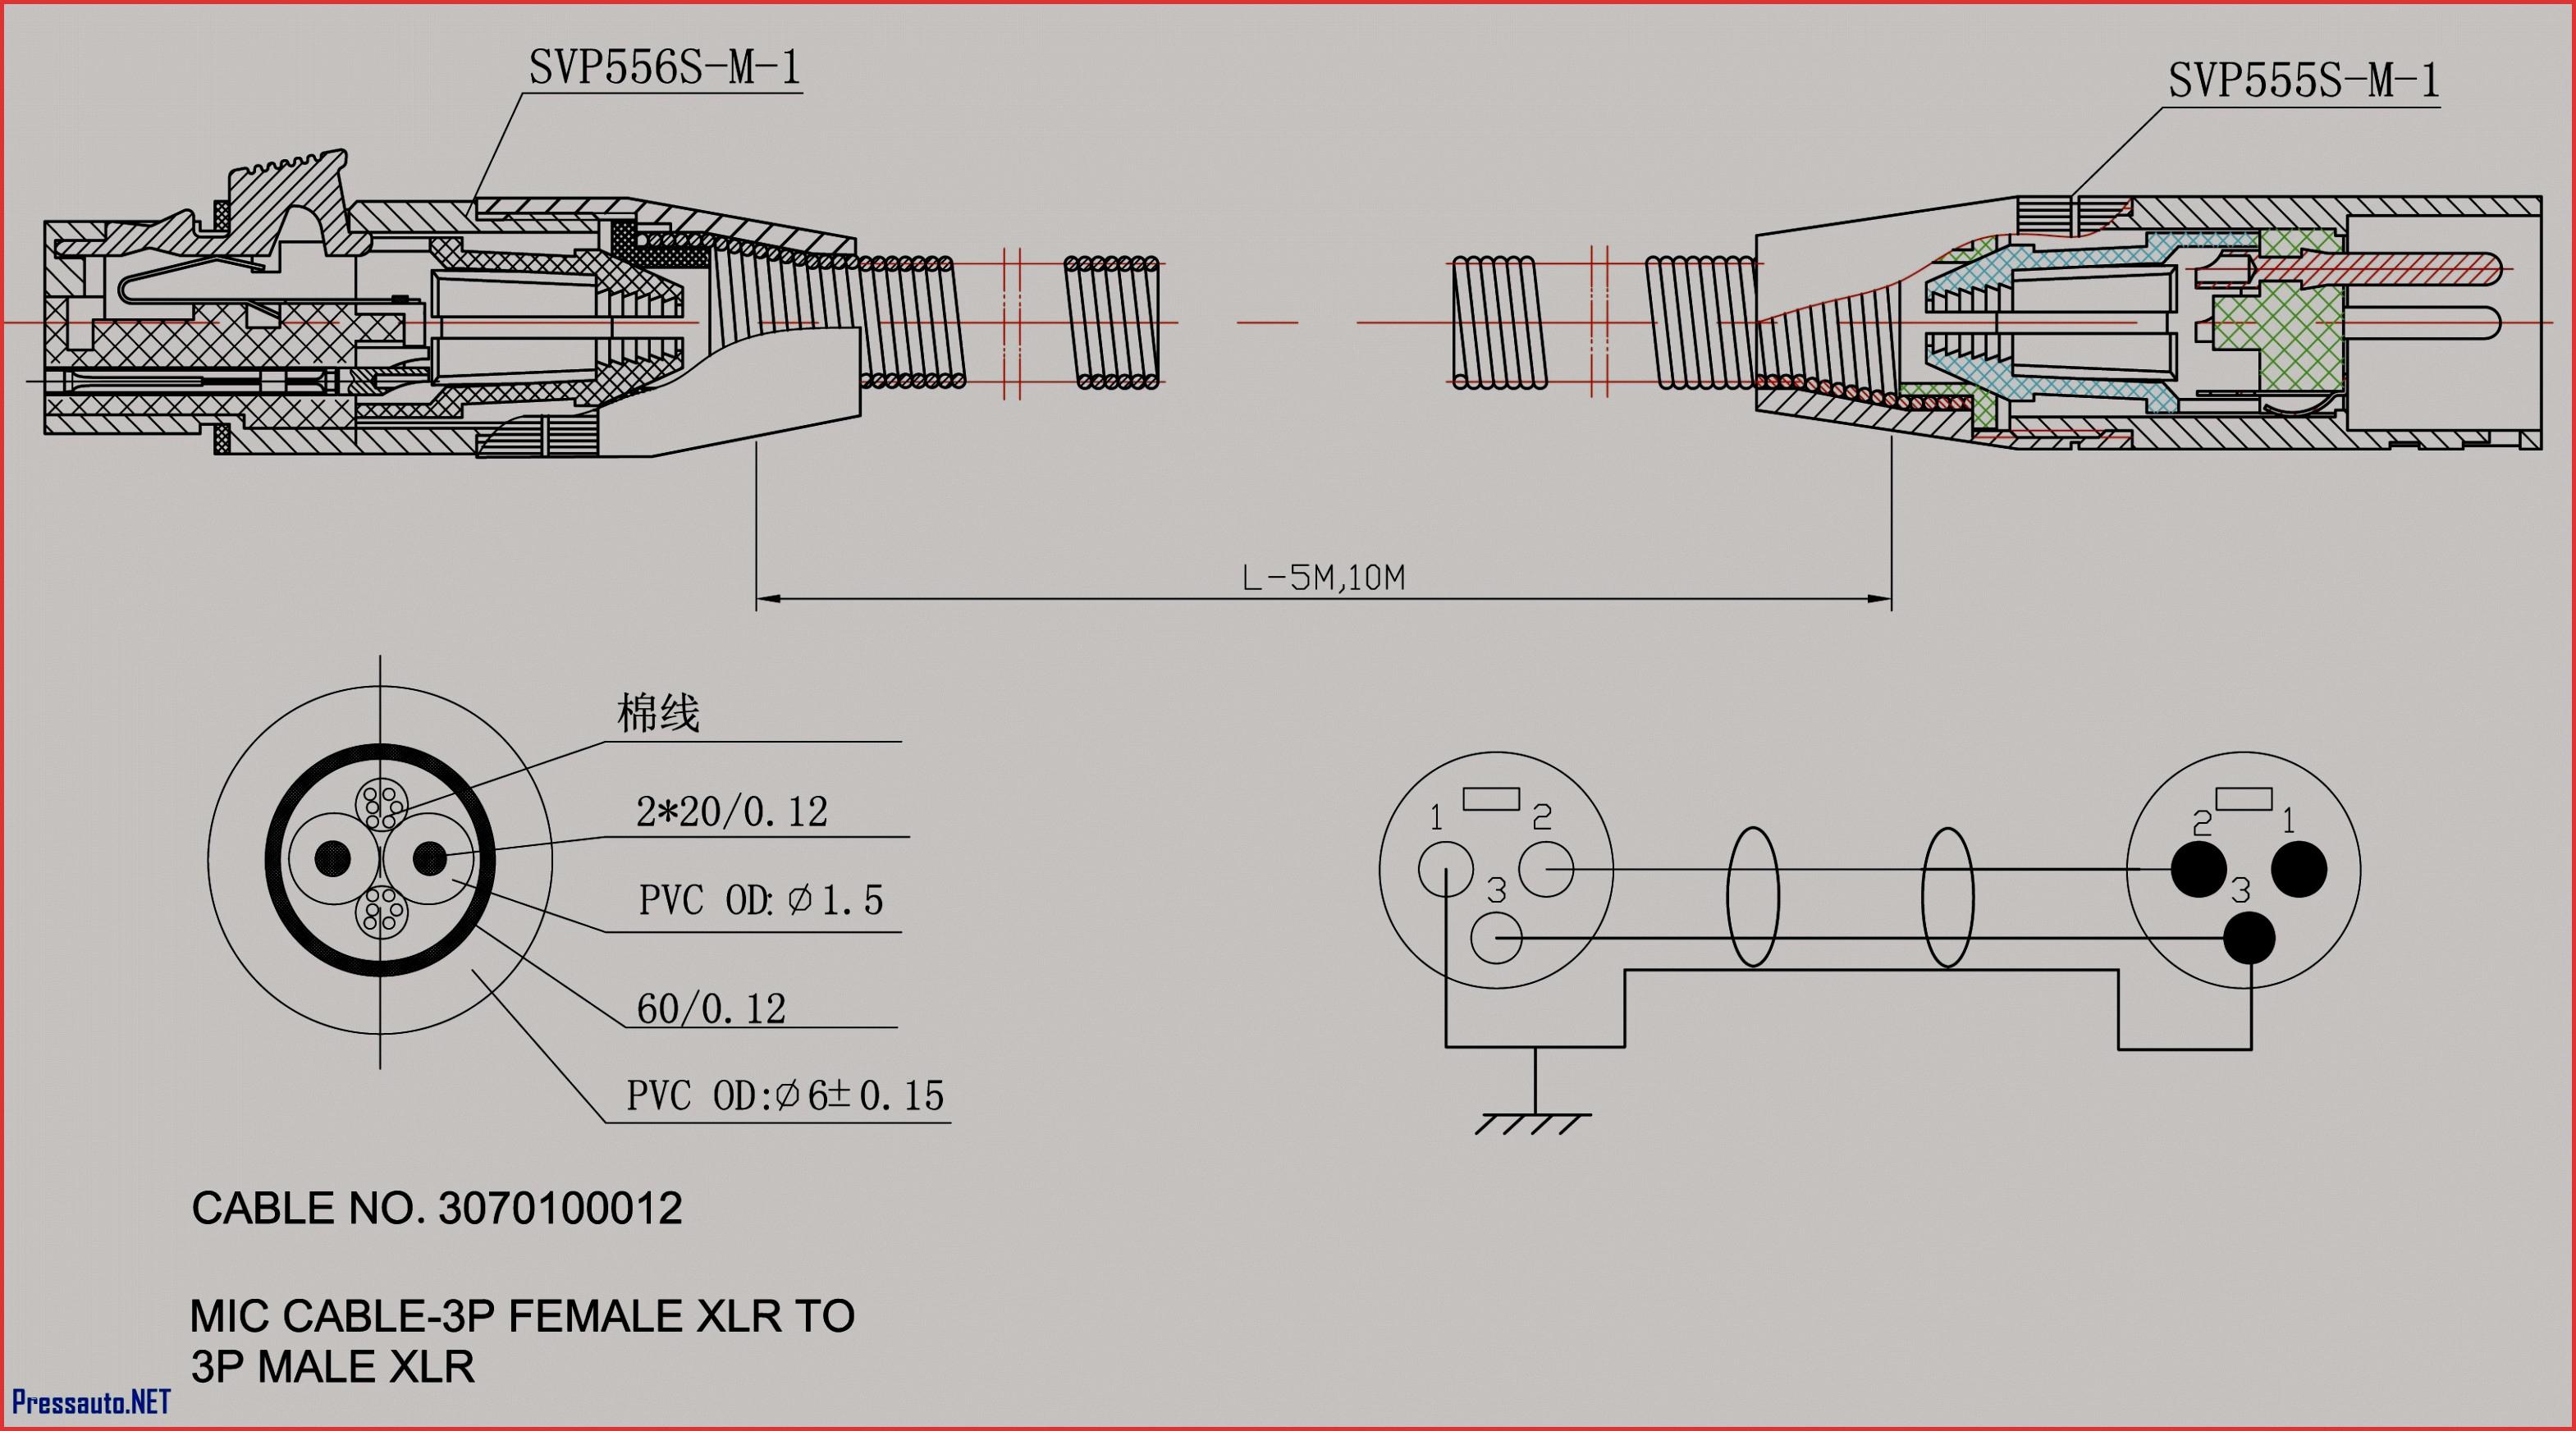 Wiring Diagram For Led Trailer Lights - Ecourbano-Server - Led Trailer Lights Wiring Diagram